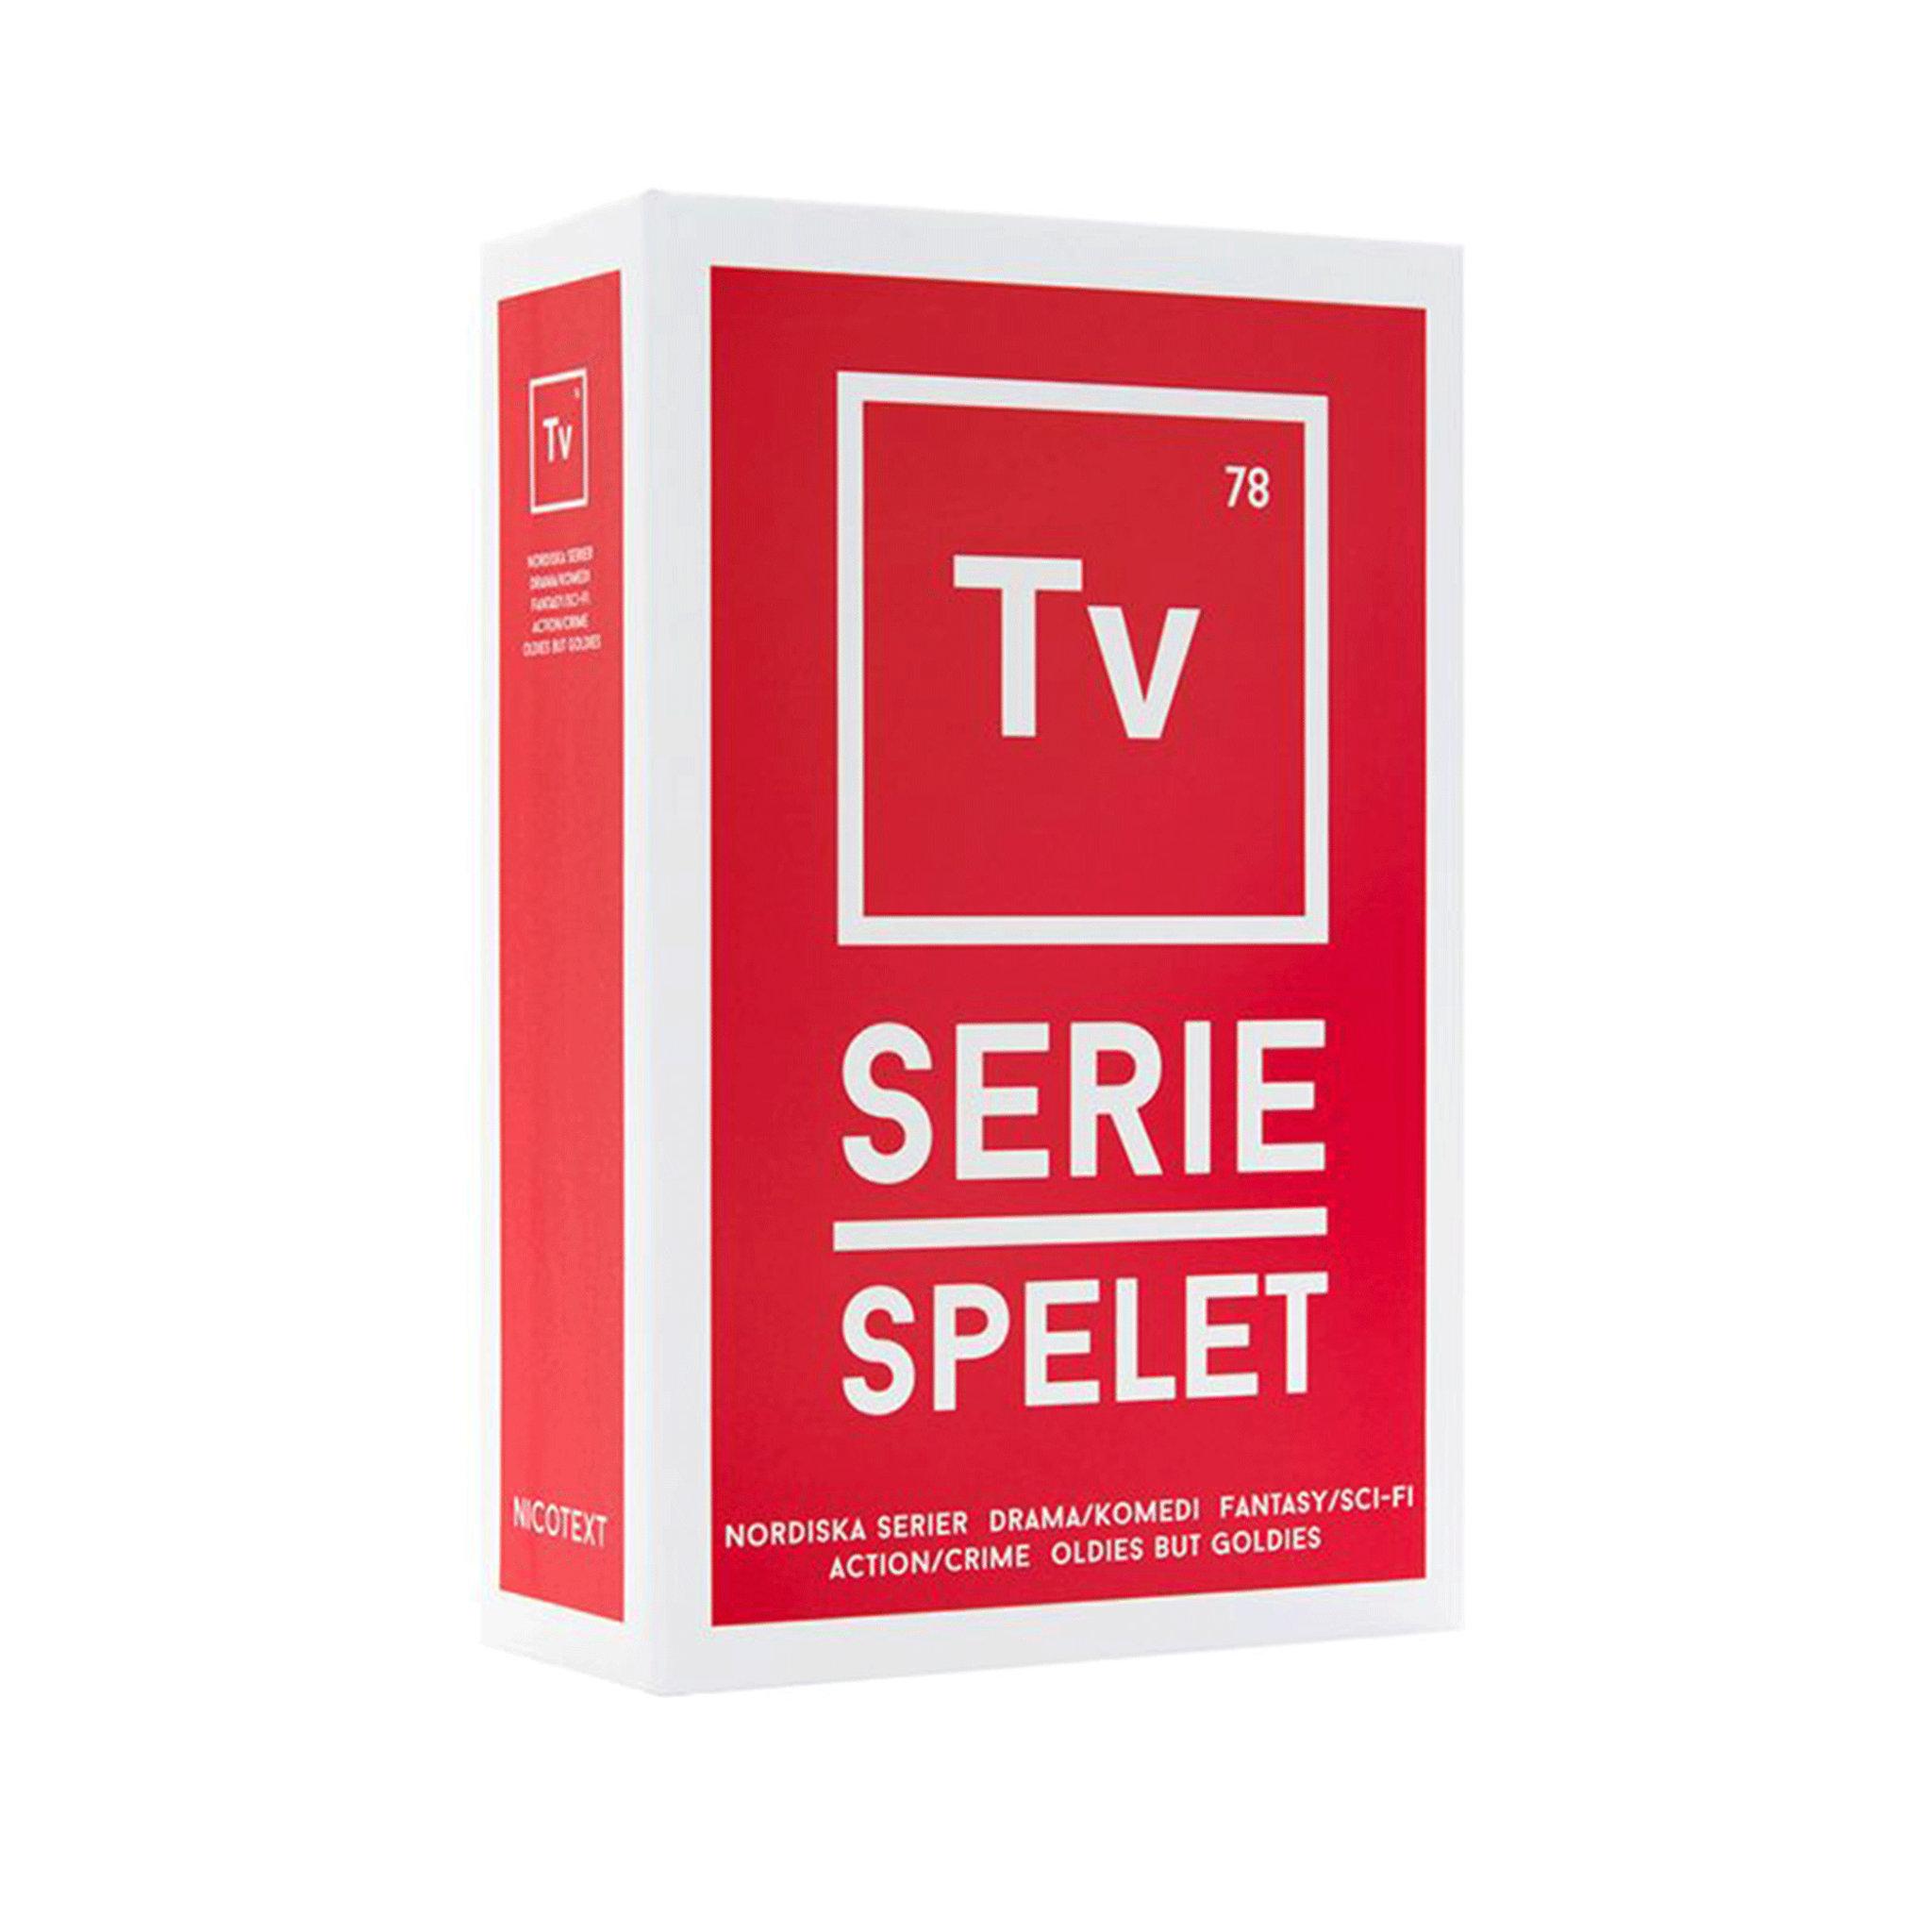 Fia med knuff Spel & pussel Köp online på åhlens.se!